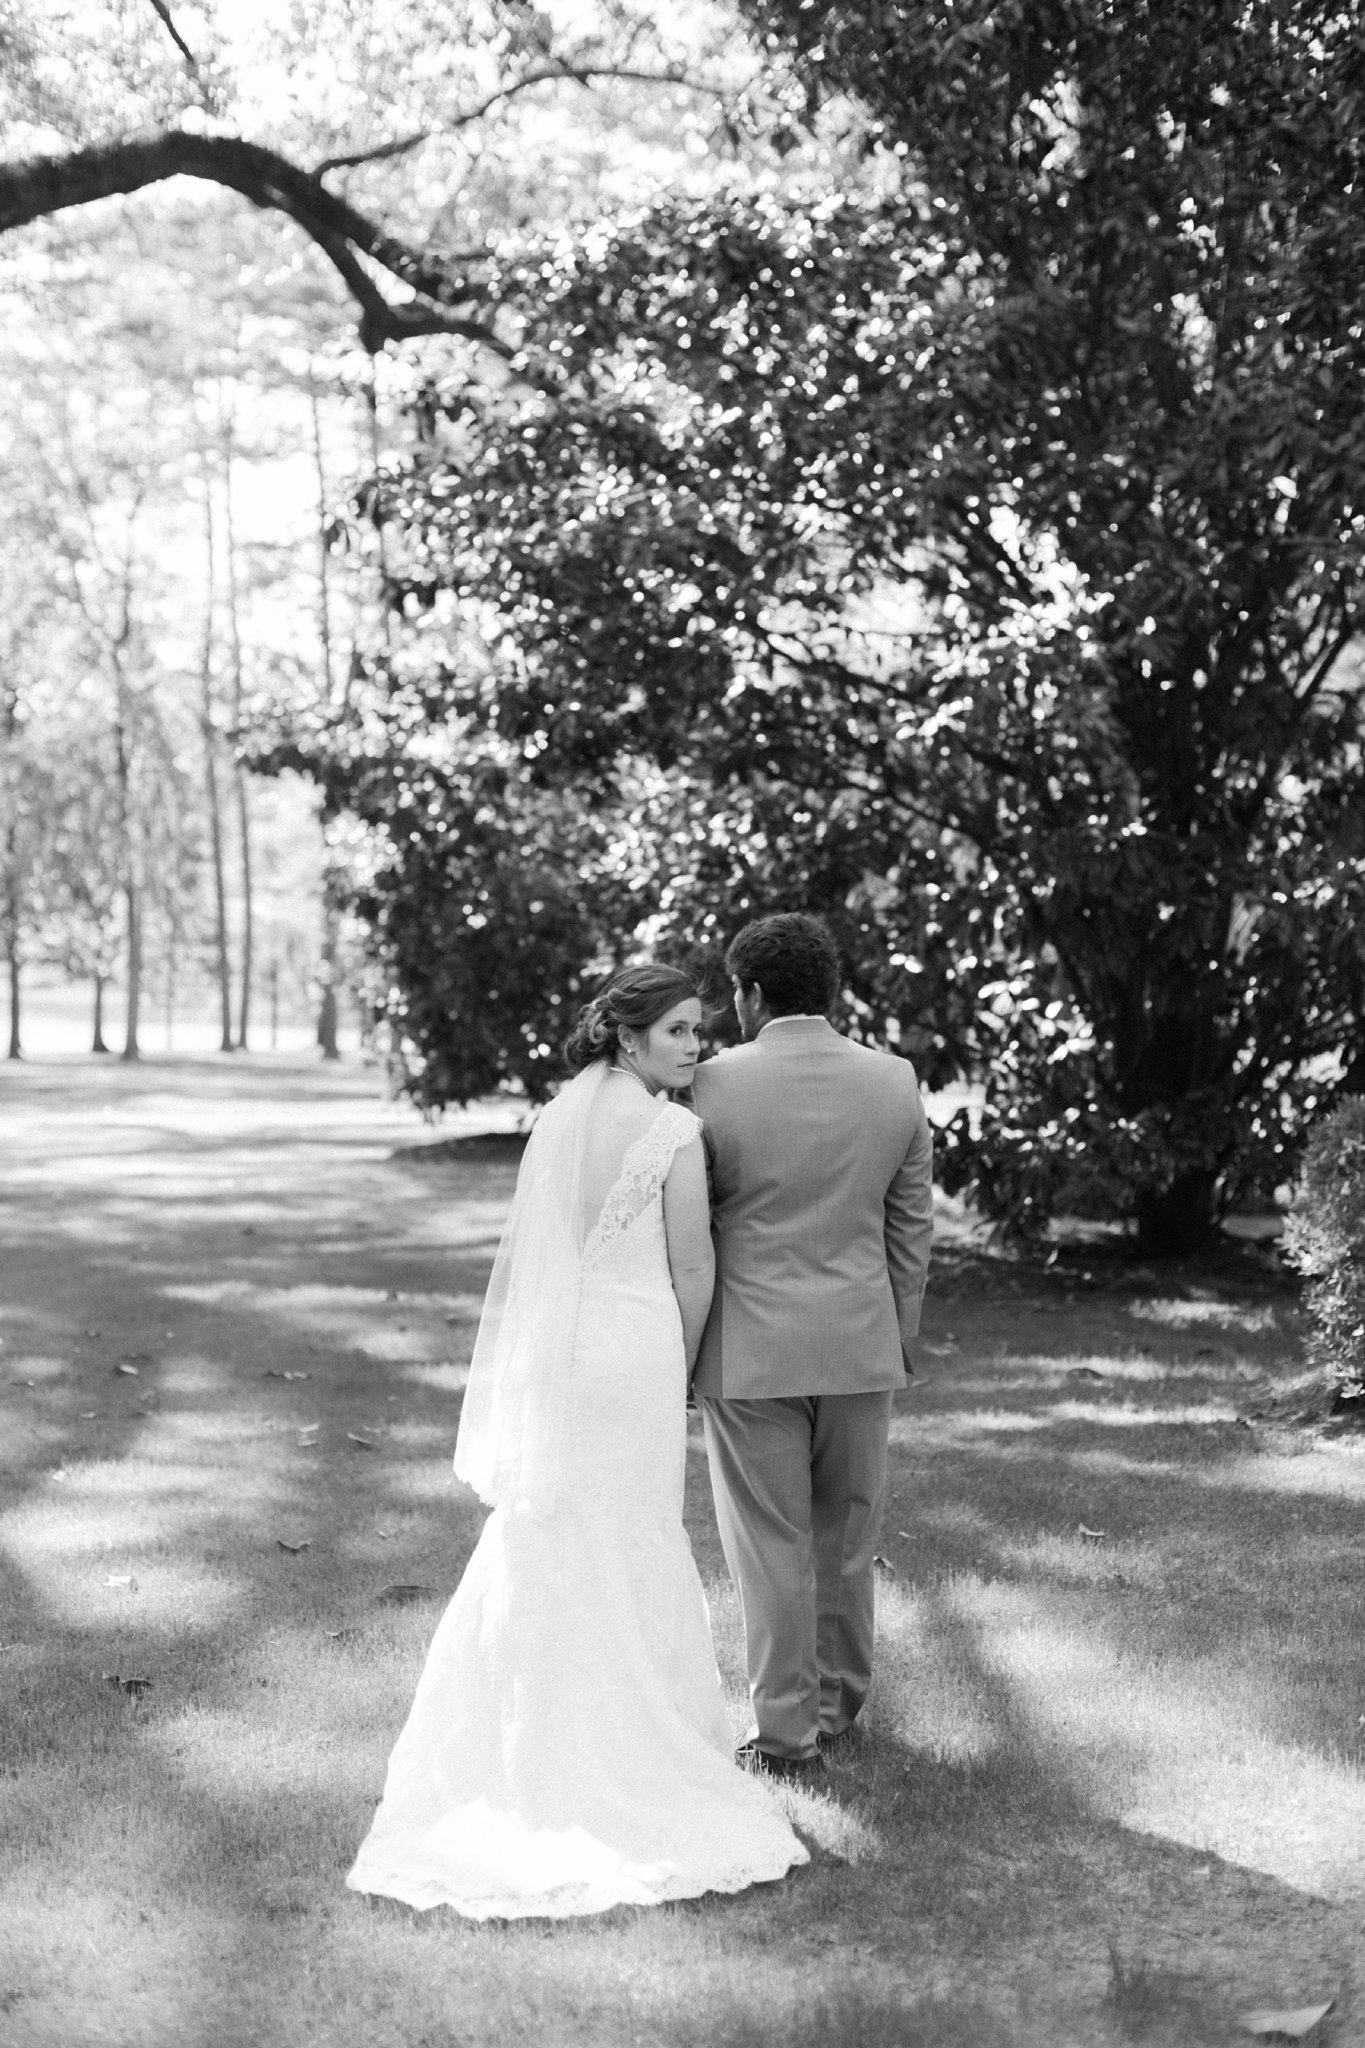 ecila farm wedding albany georgia wedding photographer shannon griffin photography-79.jpg